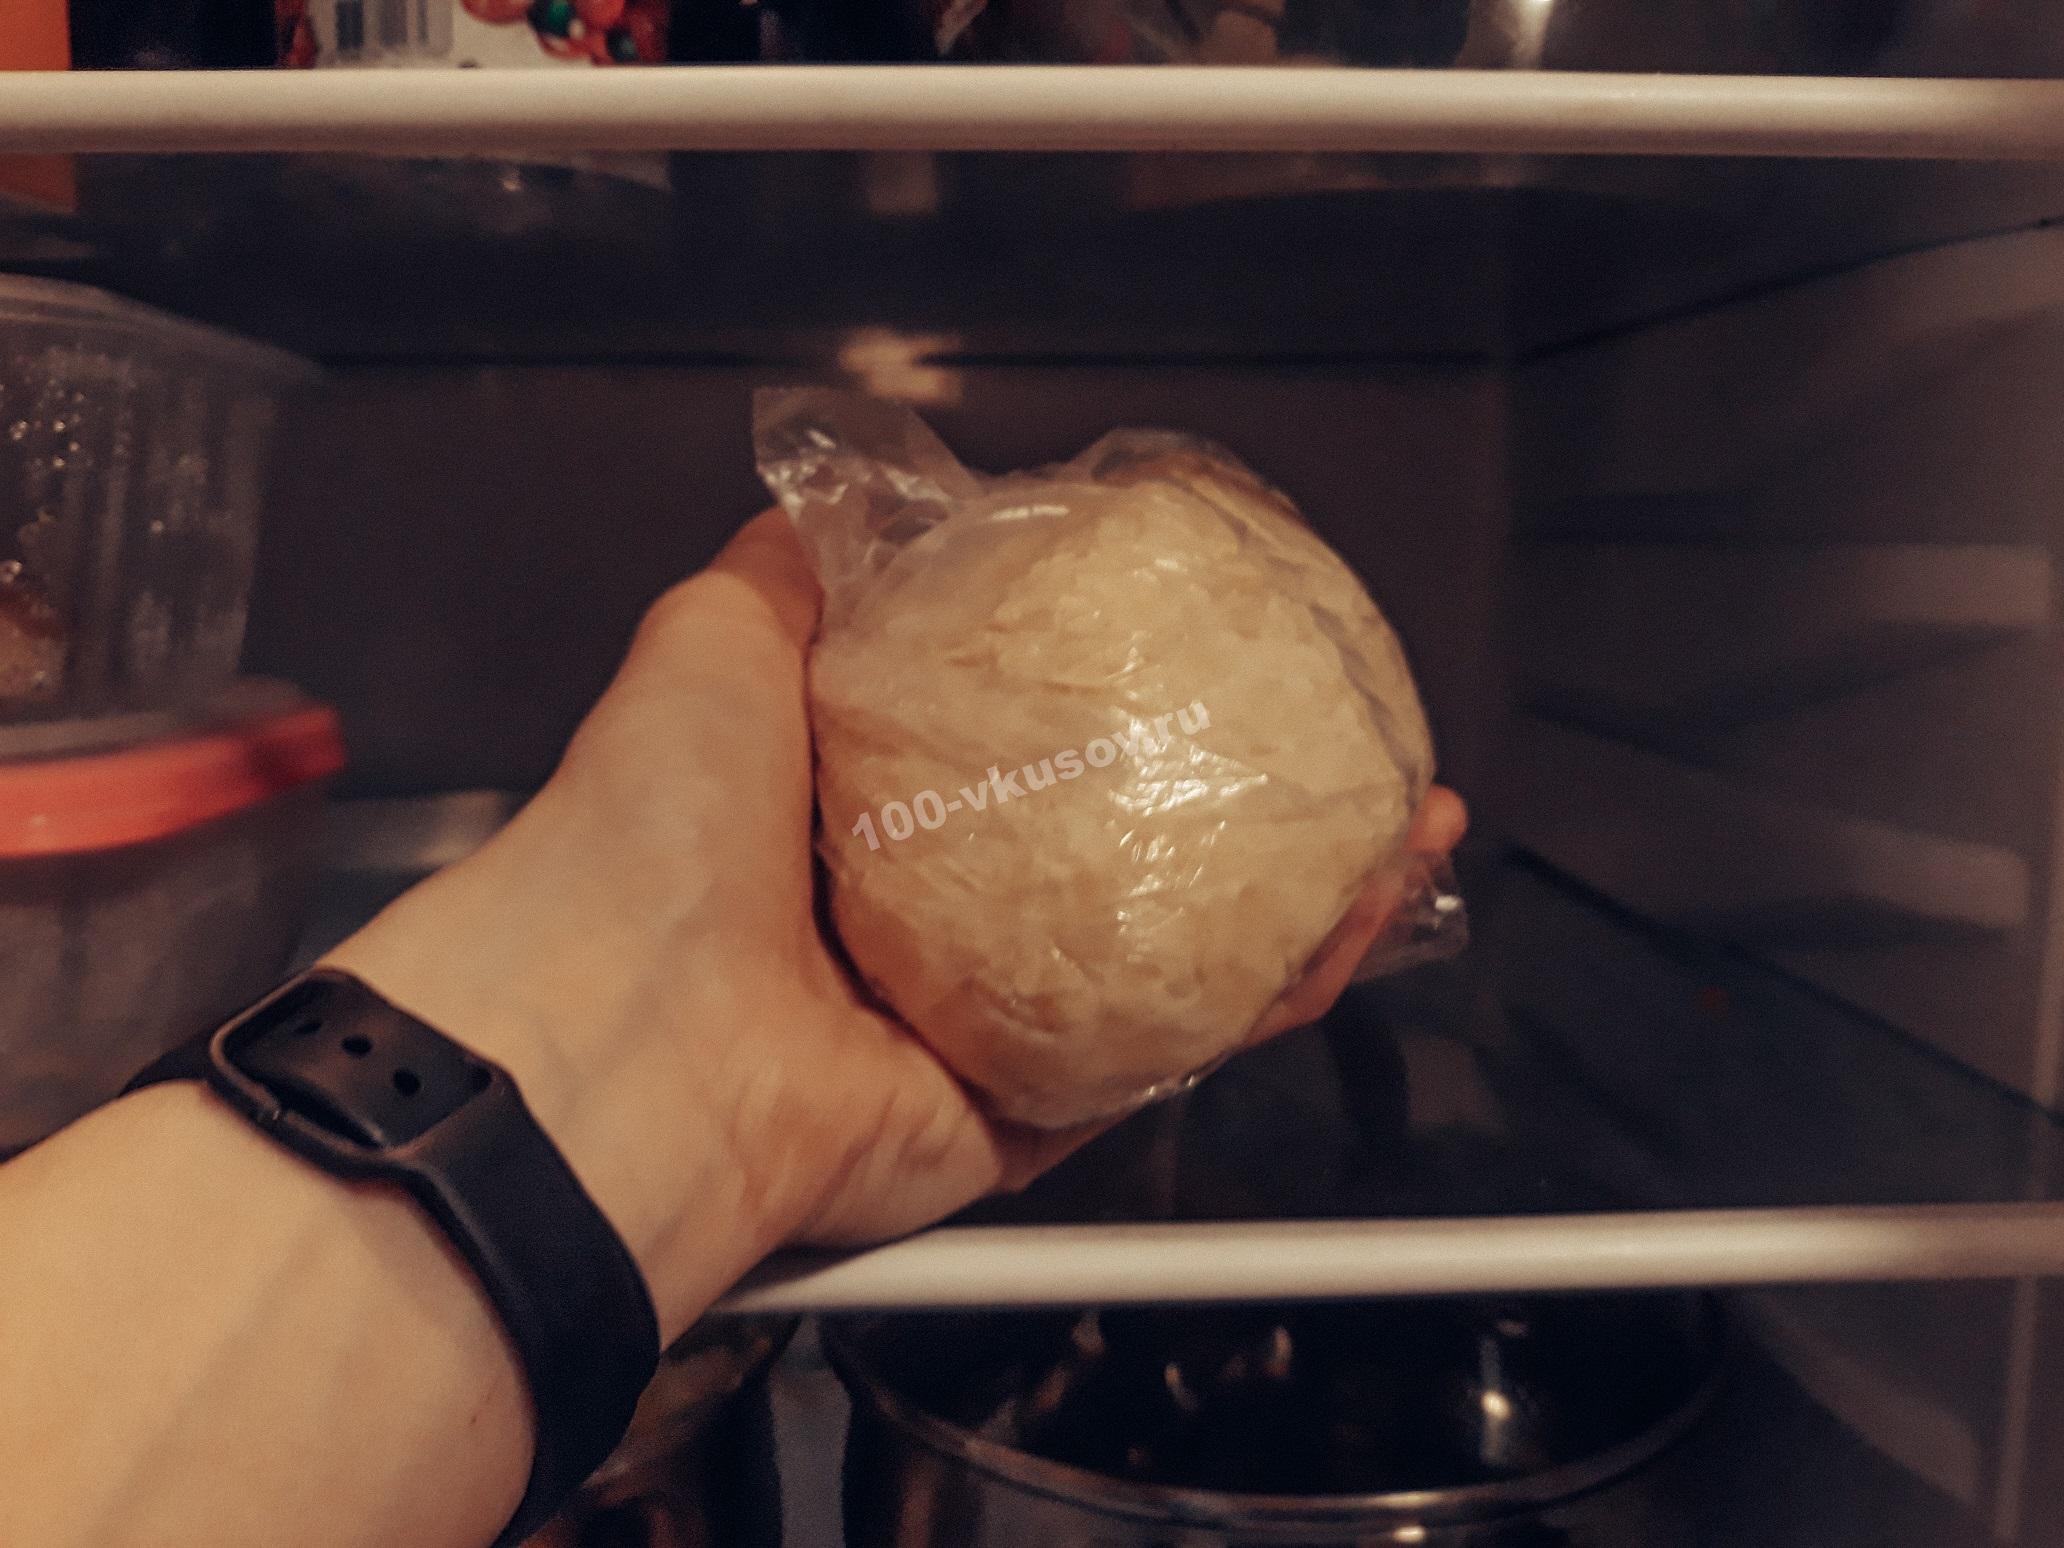 Убираем тесто в холодильник